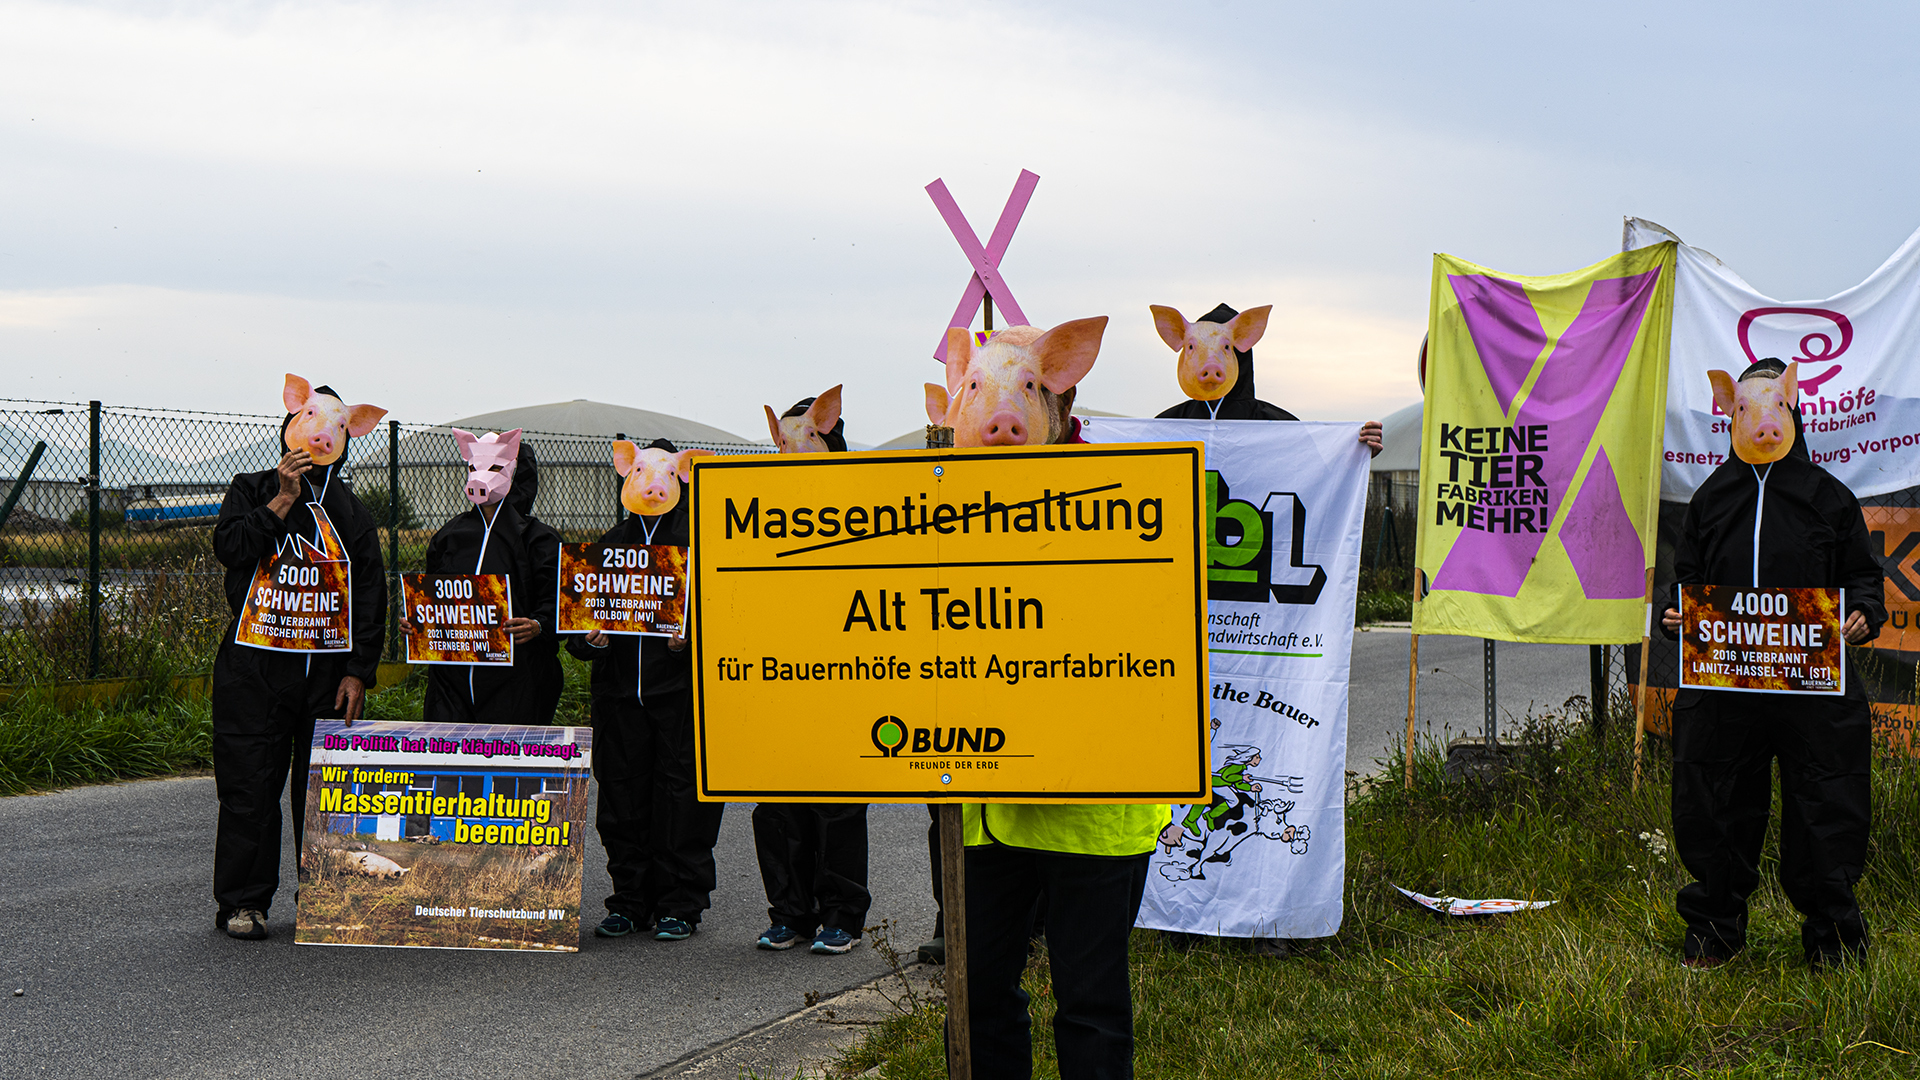 Demo in Berlin & Alt Tellin: STOP Massentierhaltung!